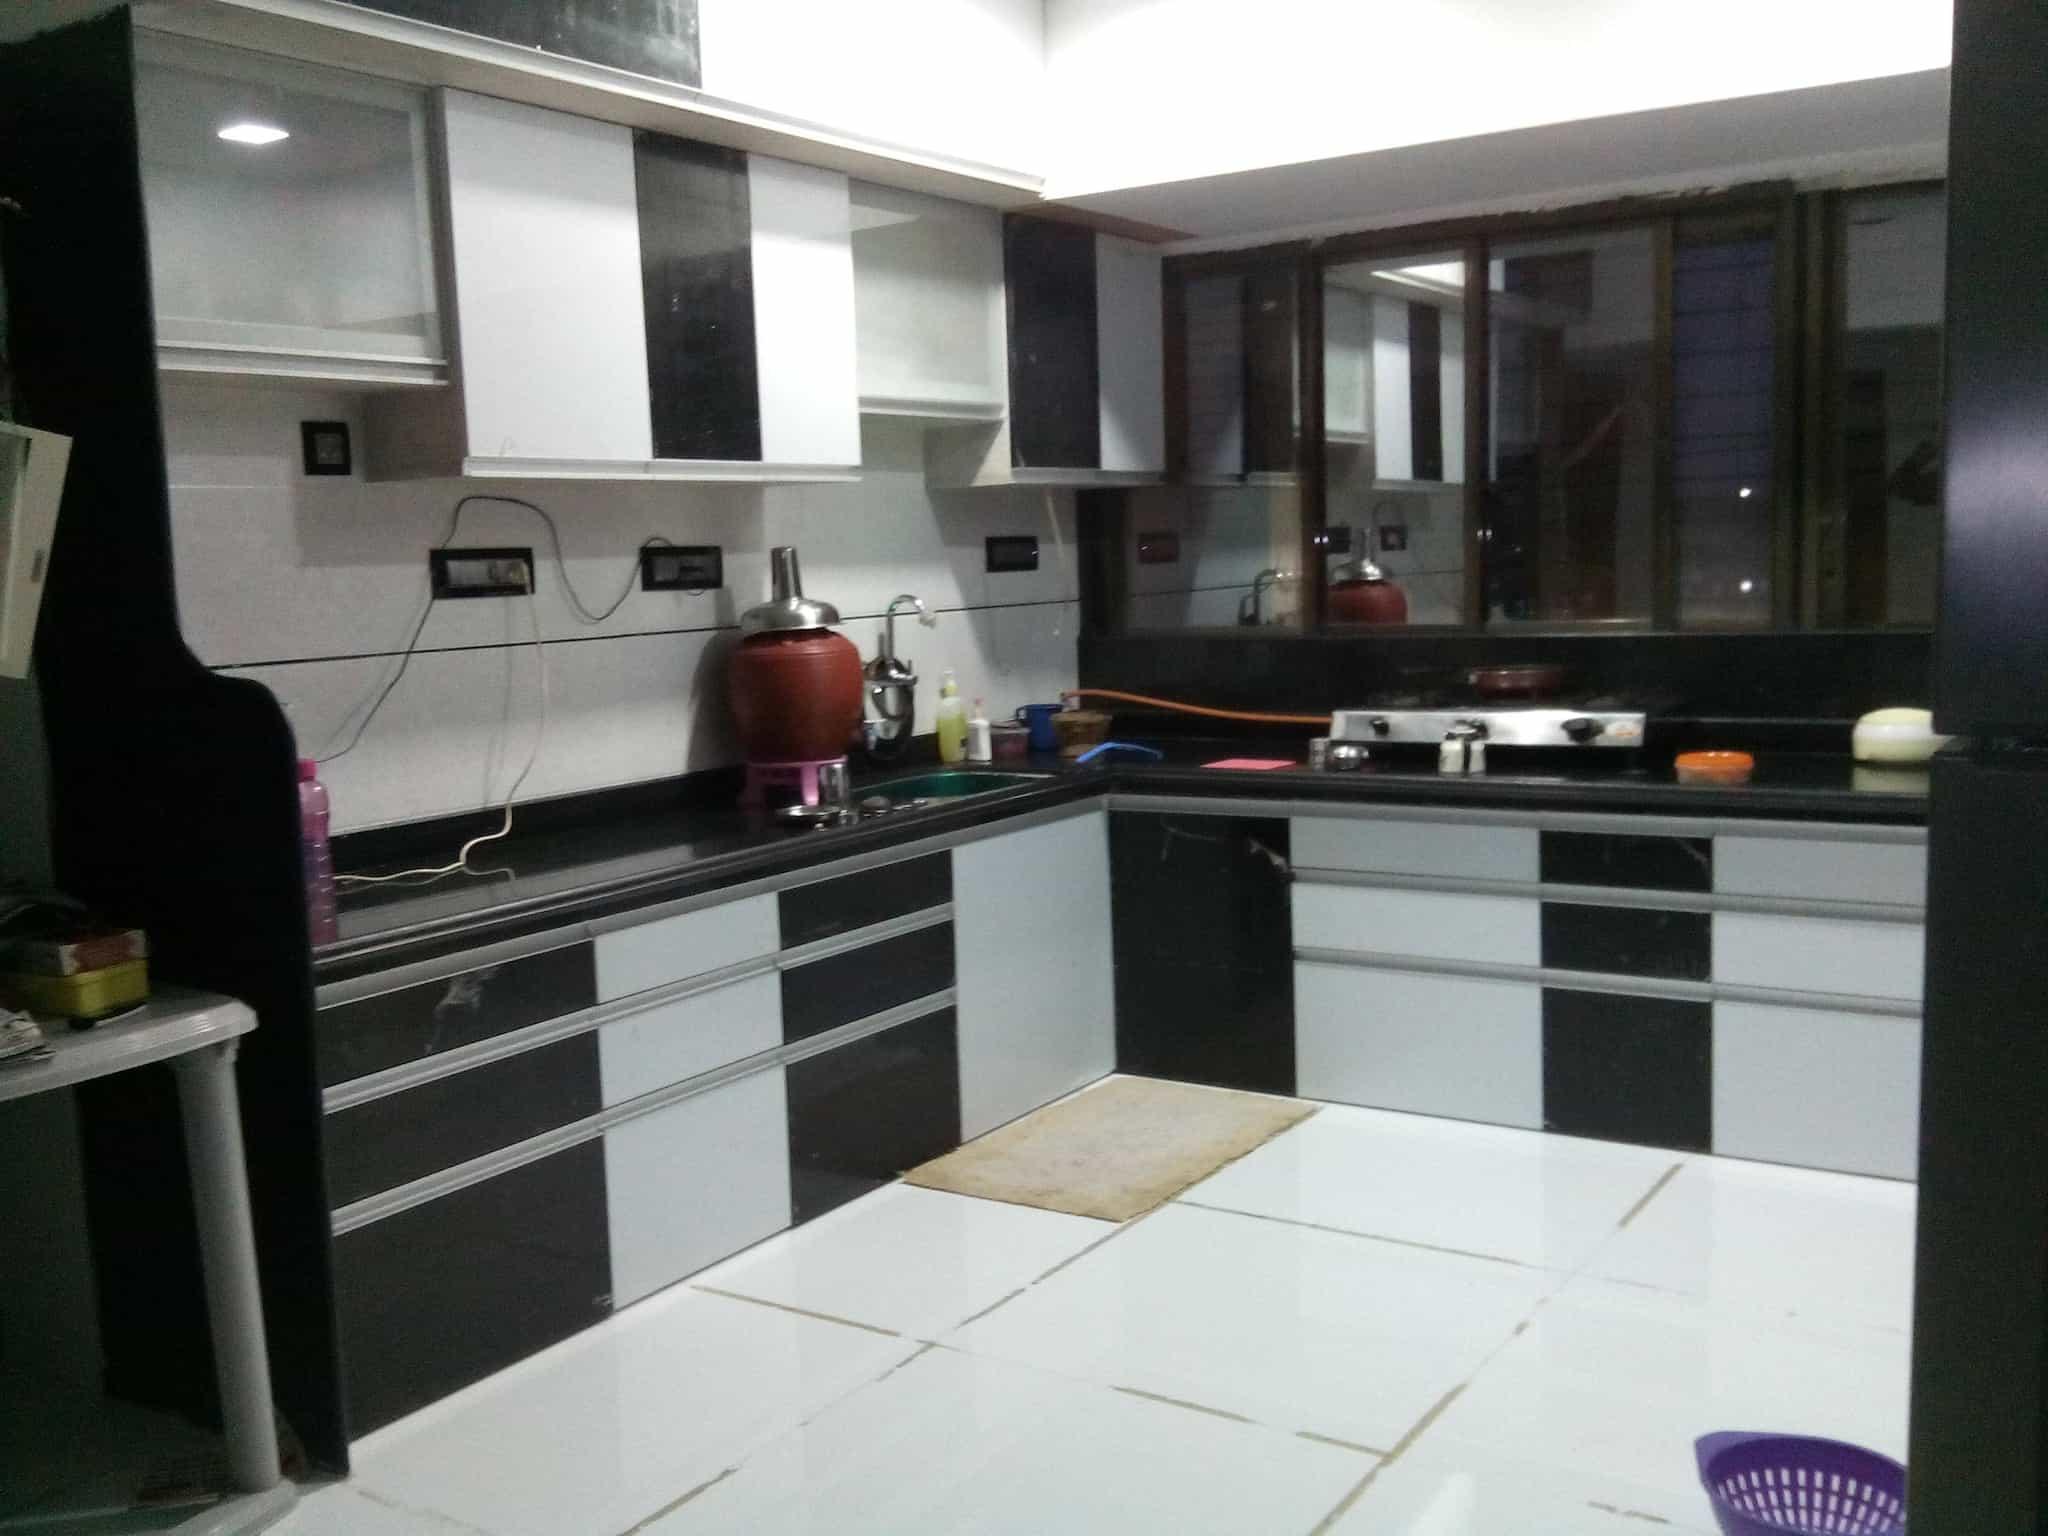 Gayatri Kitchen Furniture Photos, Mira Road, Thane  Pictures U0026 Images  Gallery   Justdial